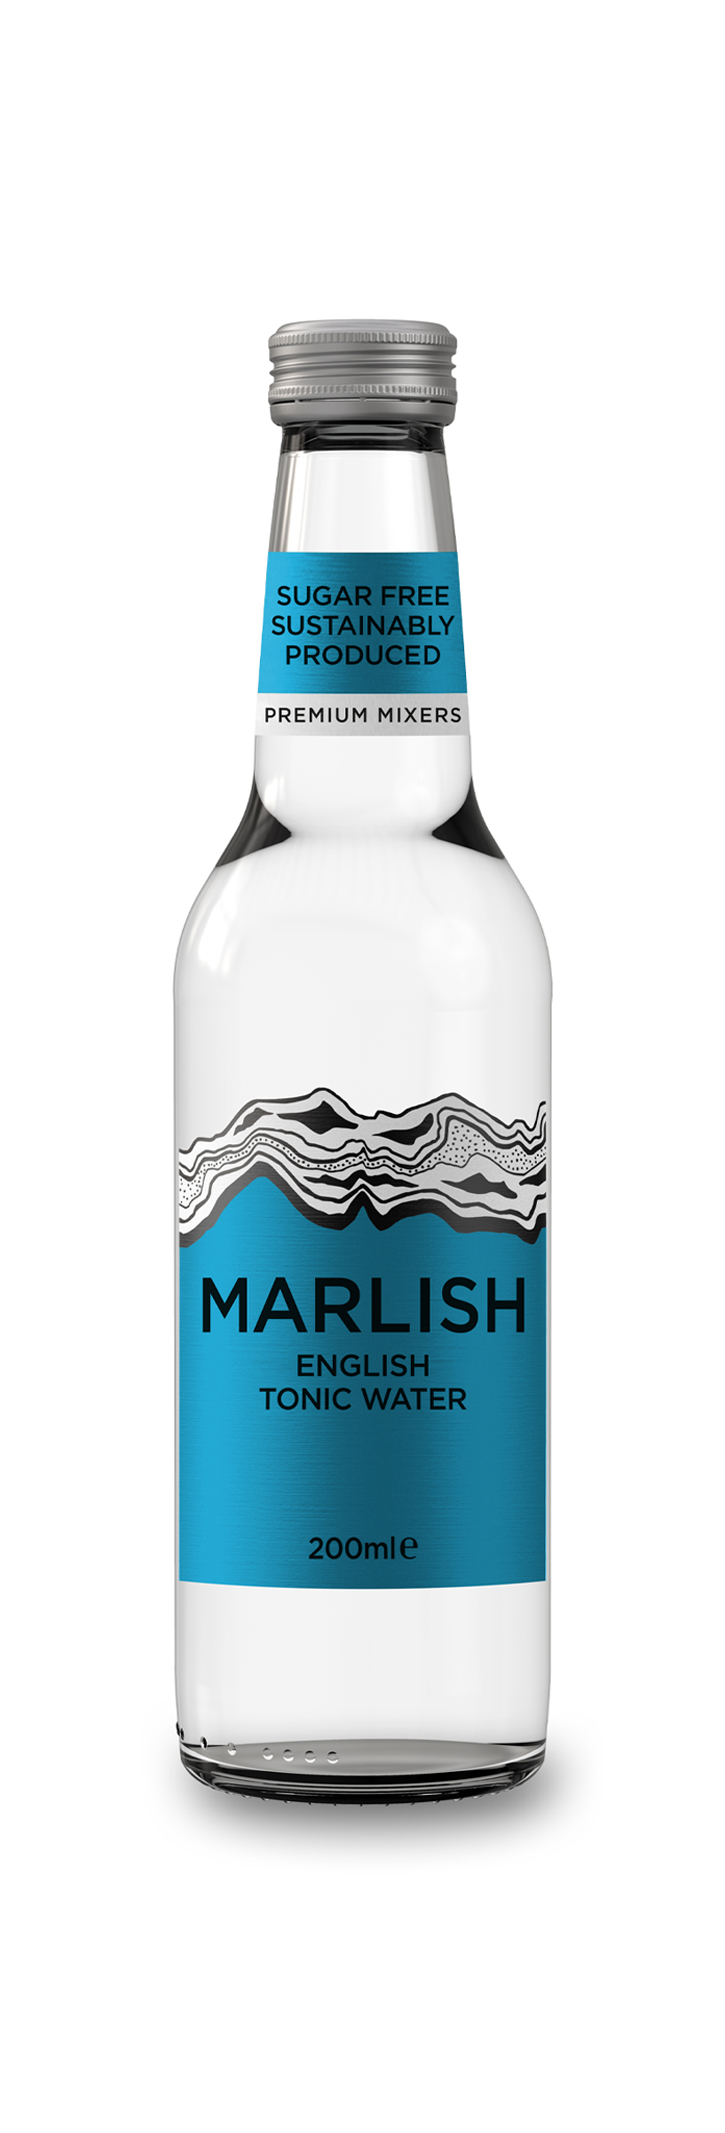 English Tonic Water